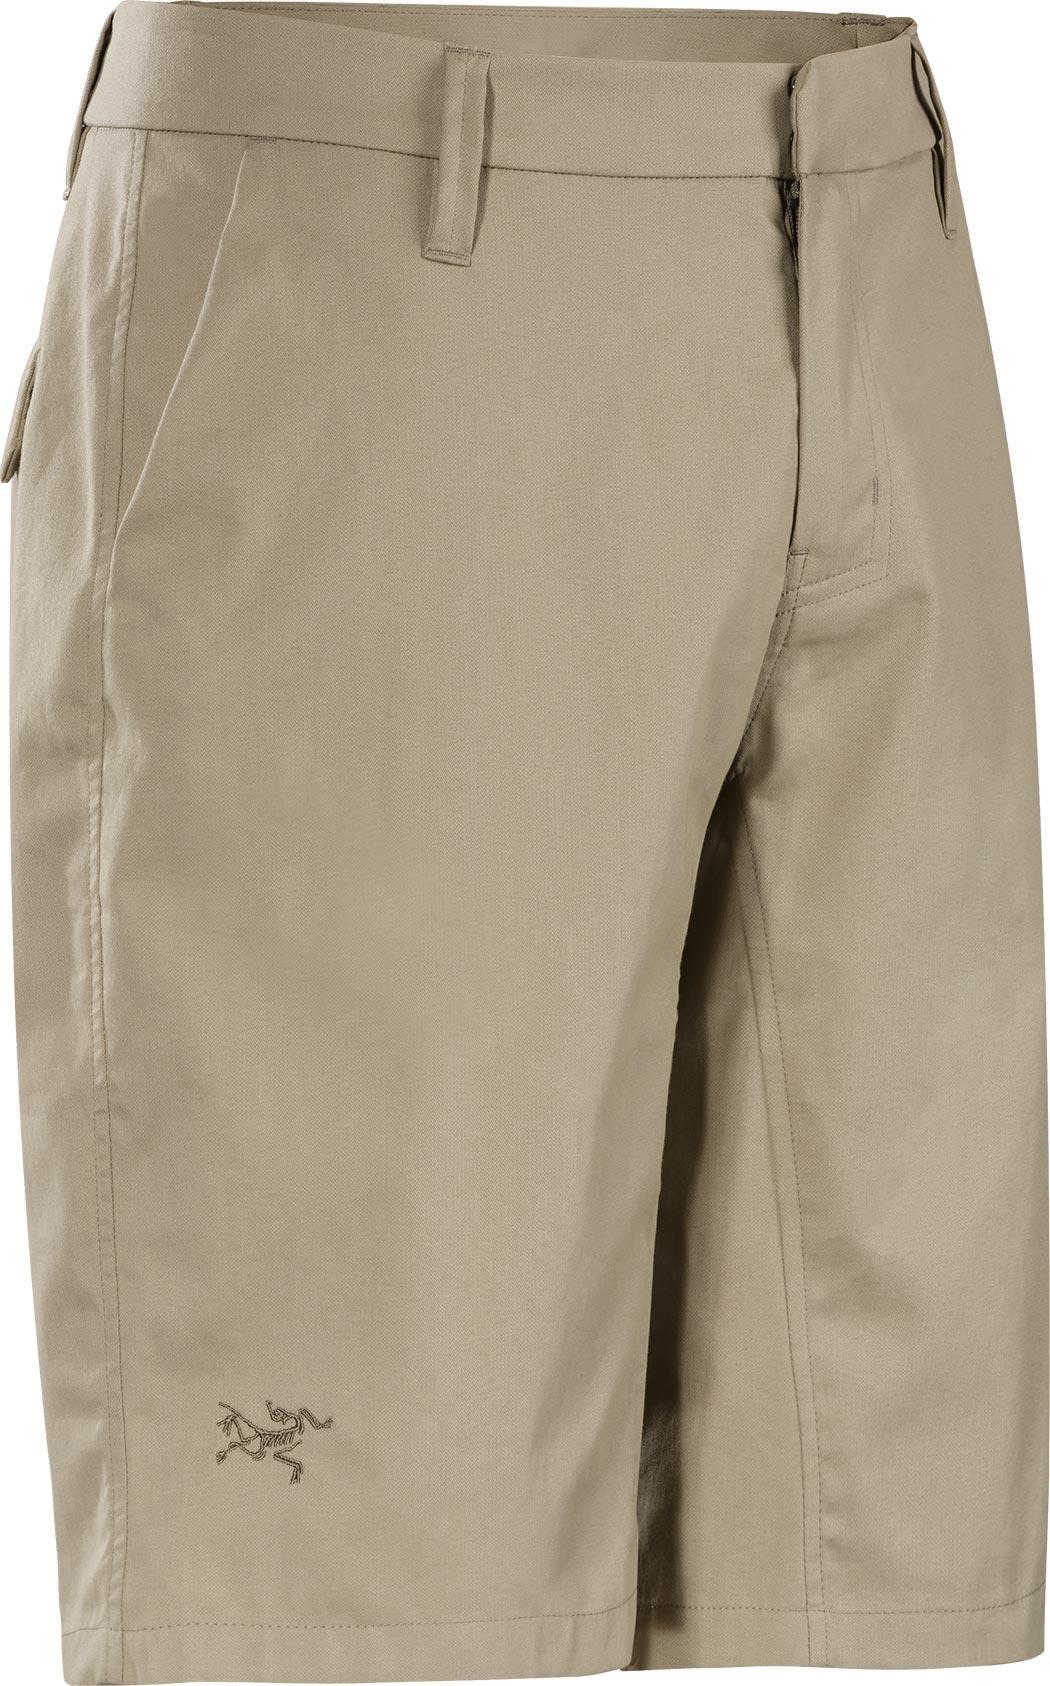 ARCTERYX(始祖鸟) A2B Chino Short Men's 休闲衣裤